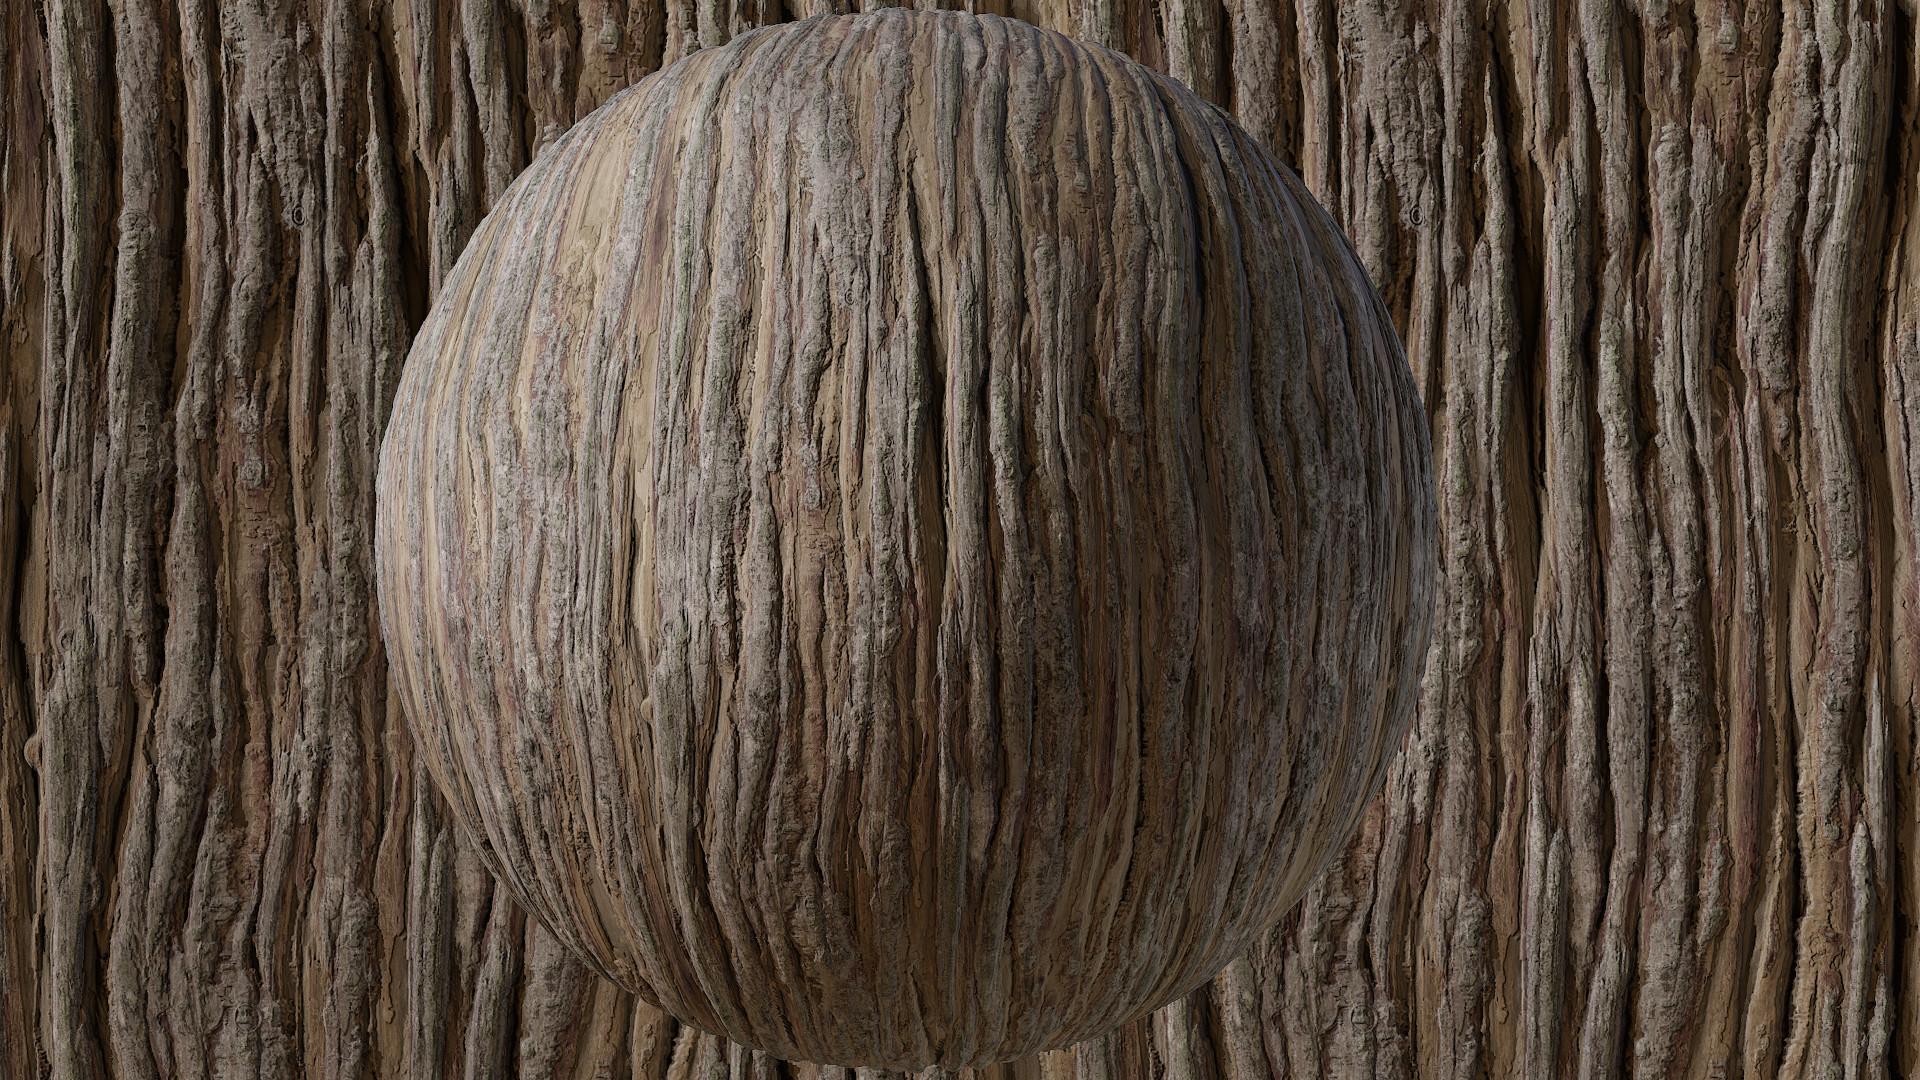 ArtStation - Cypress Bark - Substance Material, Peter Sekula